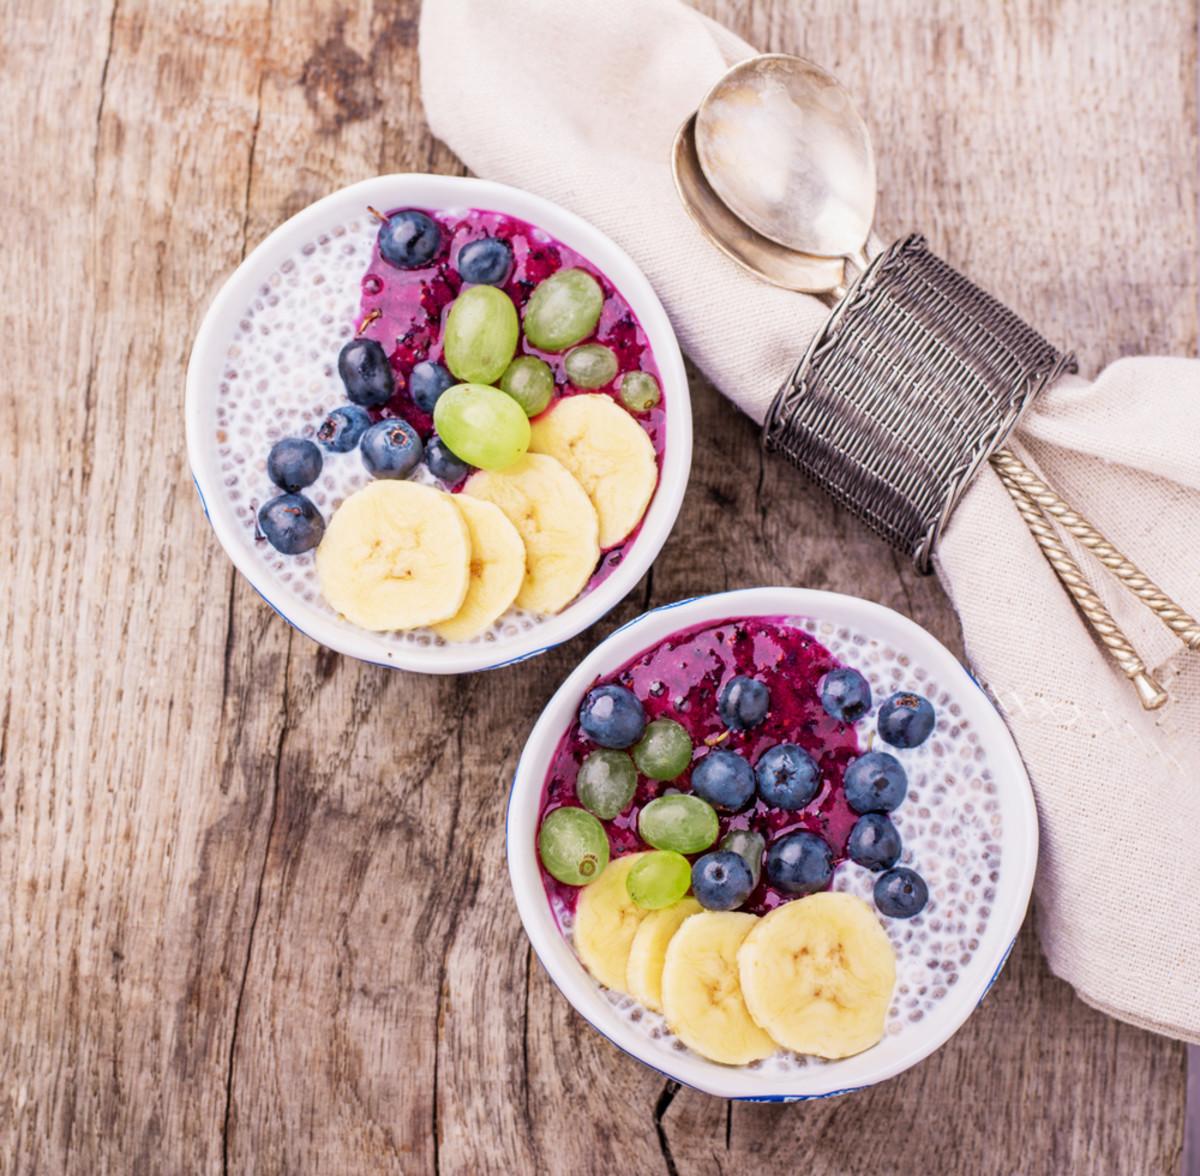 Best Vegan Breakfast Recipes  31 Vegan Breakfast Recipes That ll Make You Happy You re